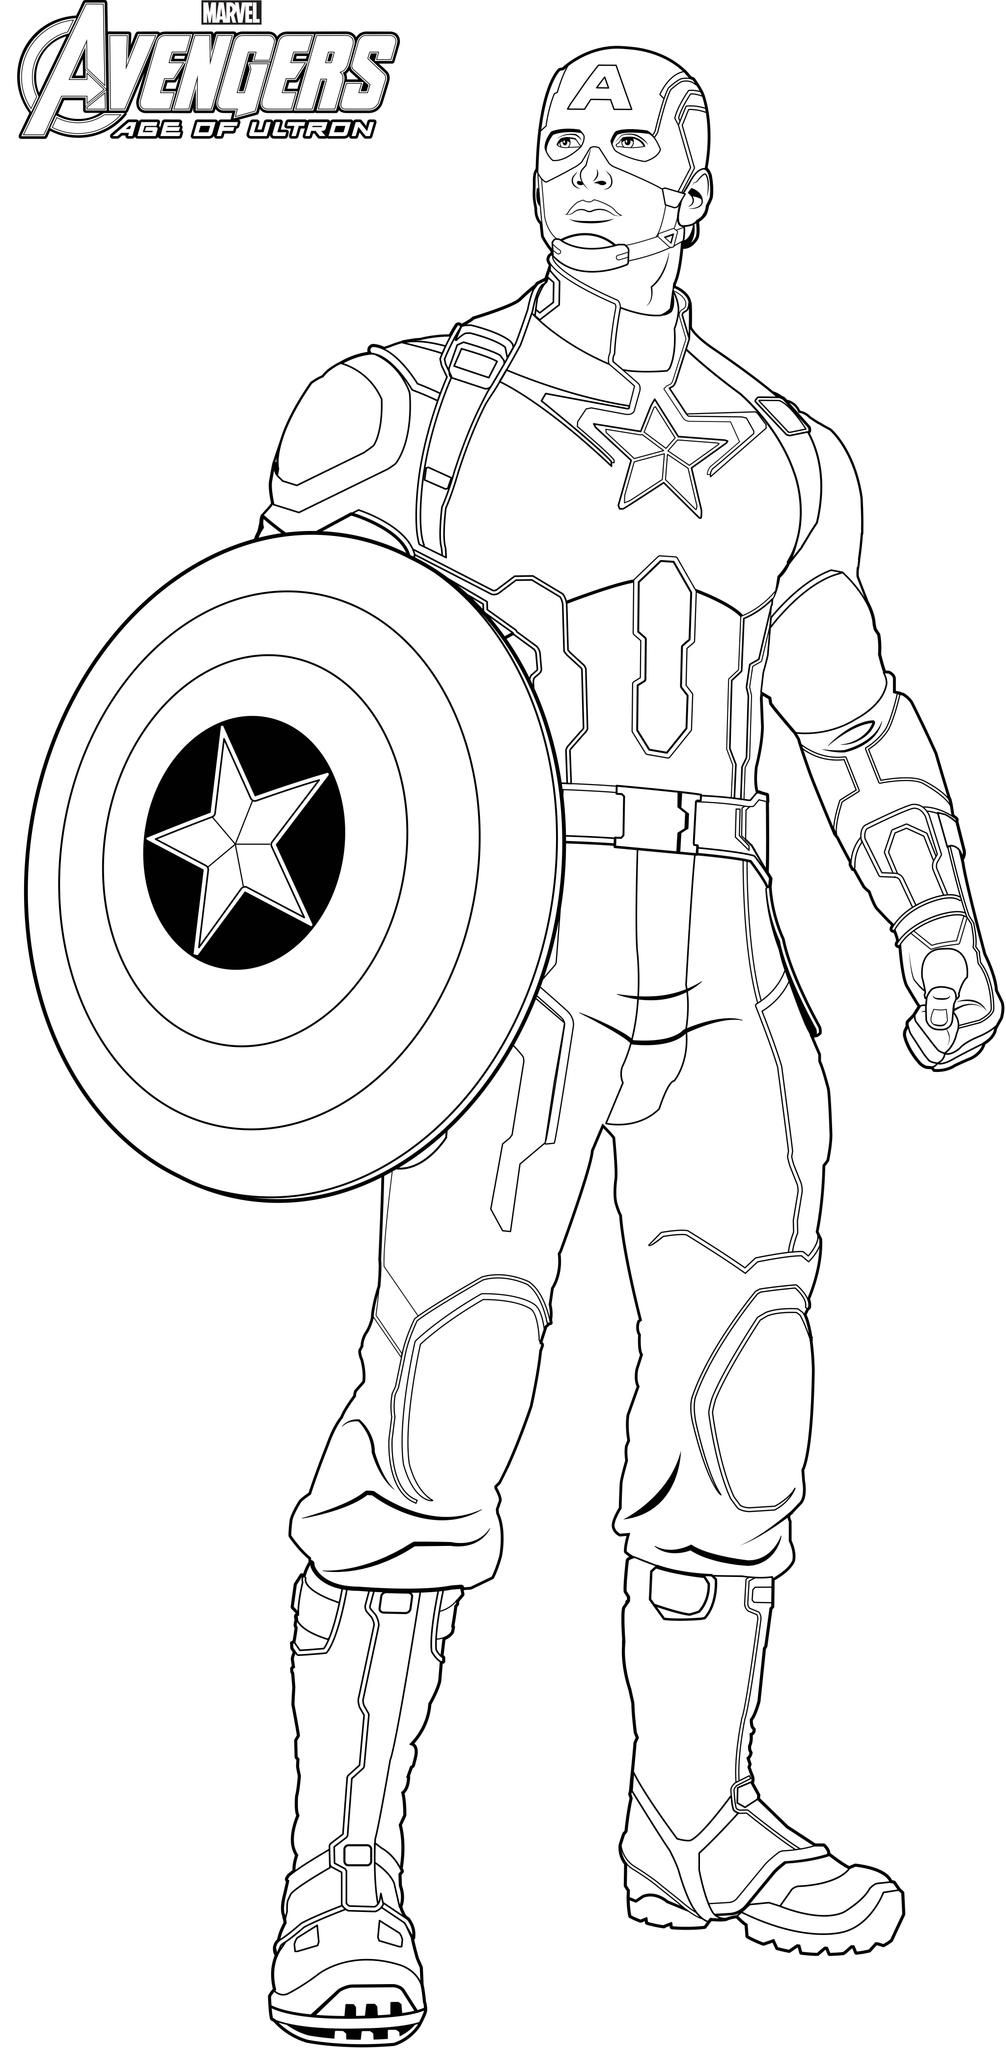 17 dessins de coloriage captain america avengers imprimer - Dessin avenger a imprimer ...